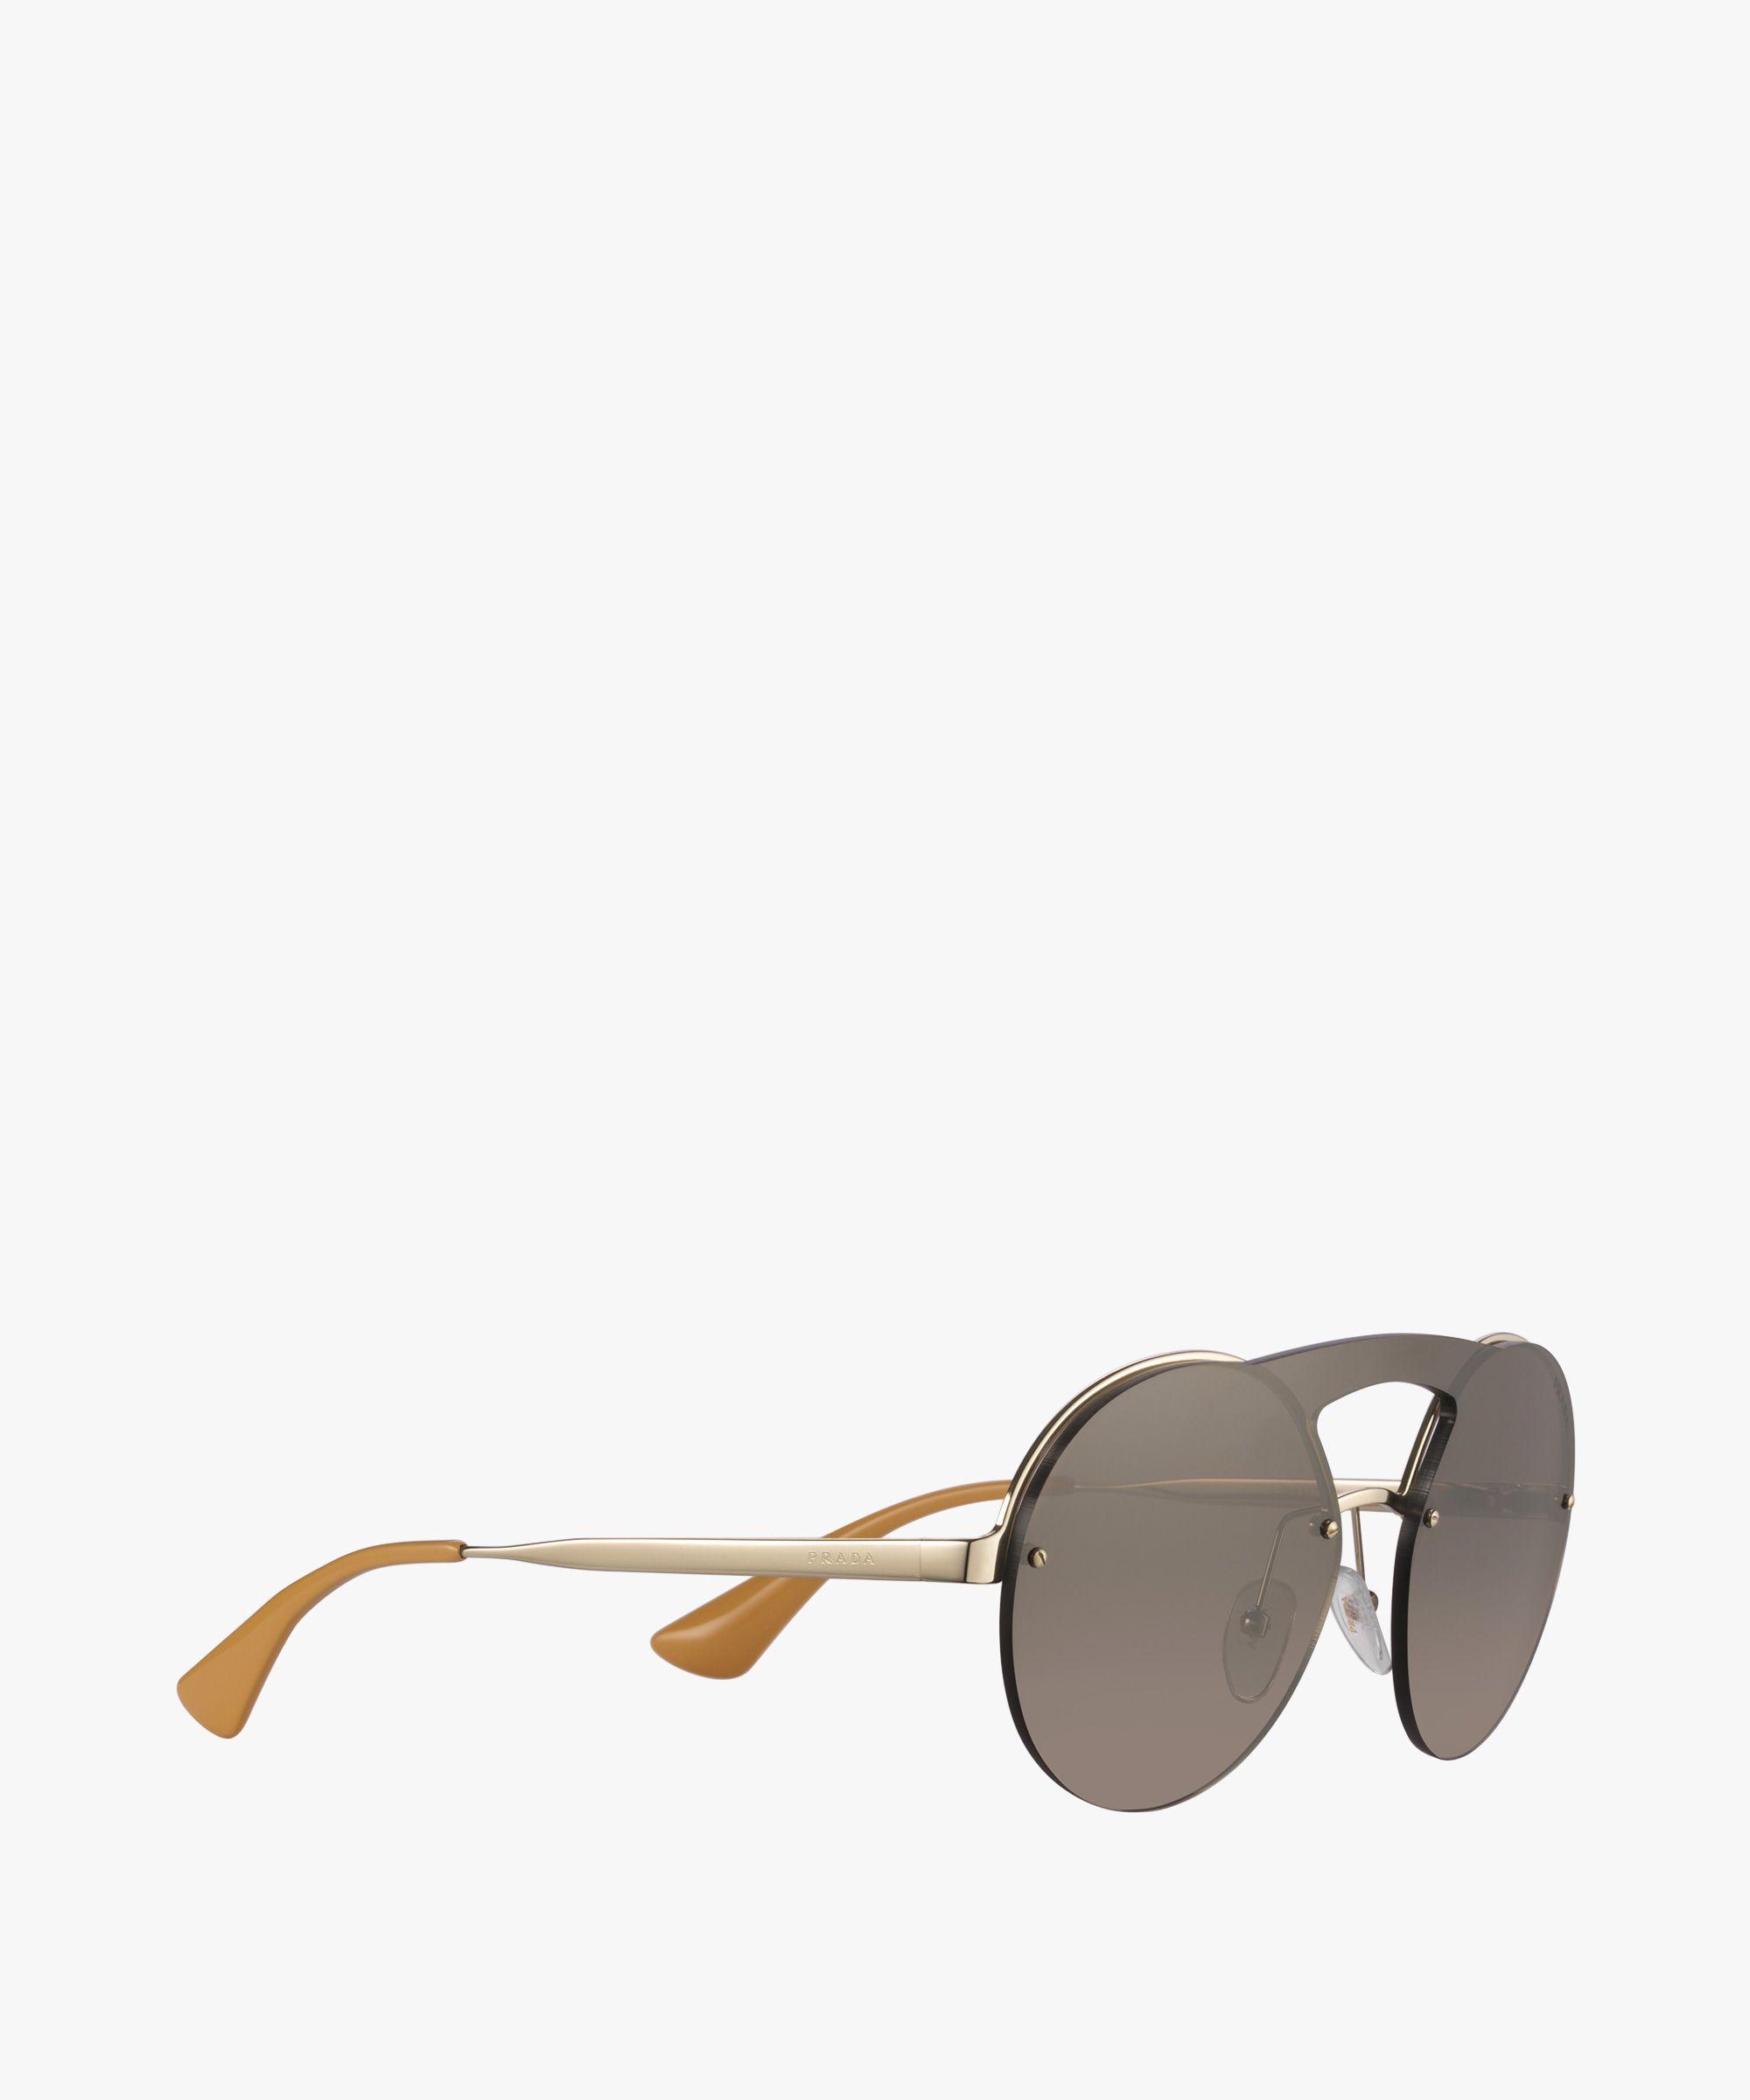 0003837f2b0 Prada Cinéma Eyewear Prada MIRRORED GRADIENT ANTHRACITE GRAY TO BROWN LENSES